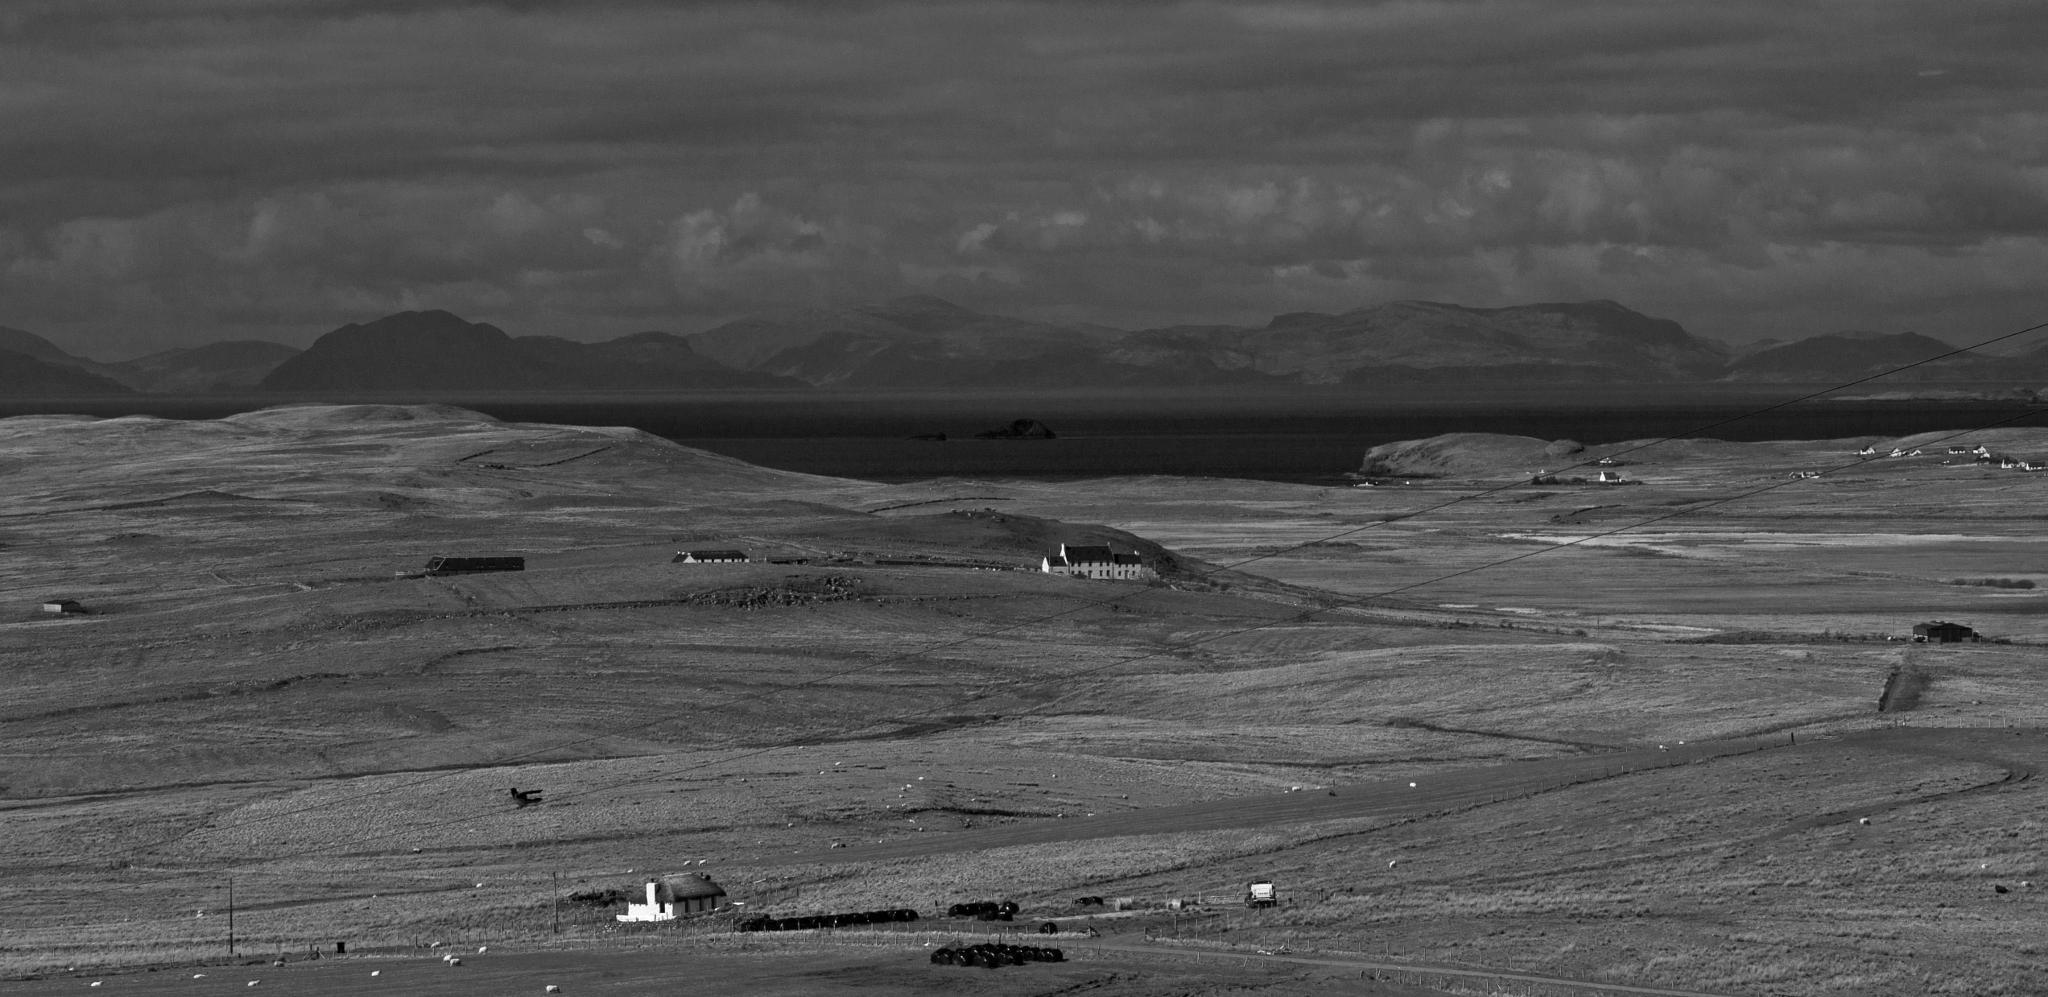 Life in the Highlands by Gordon Rafferty